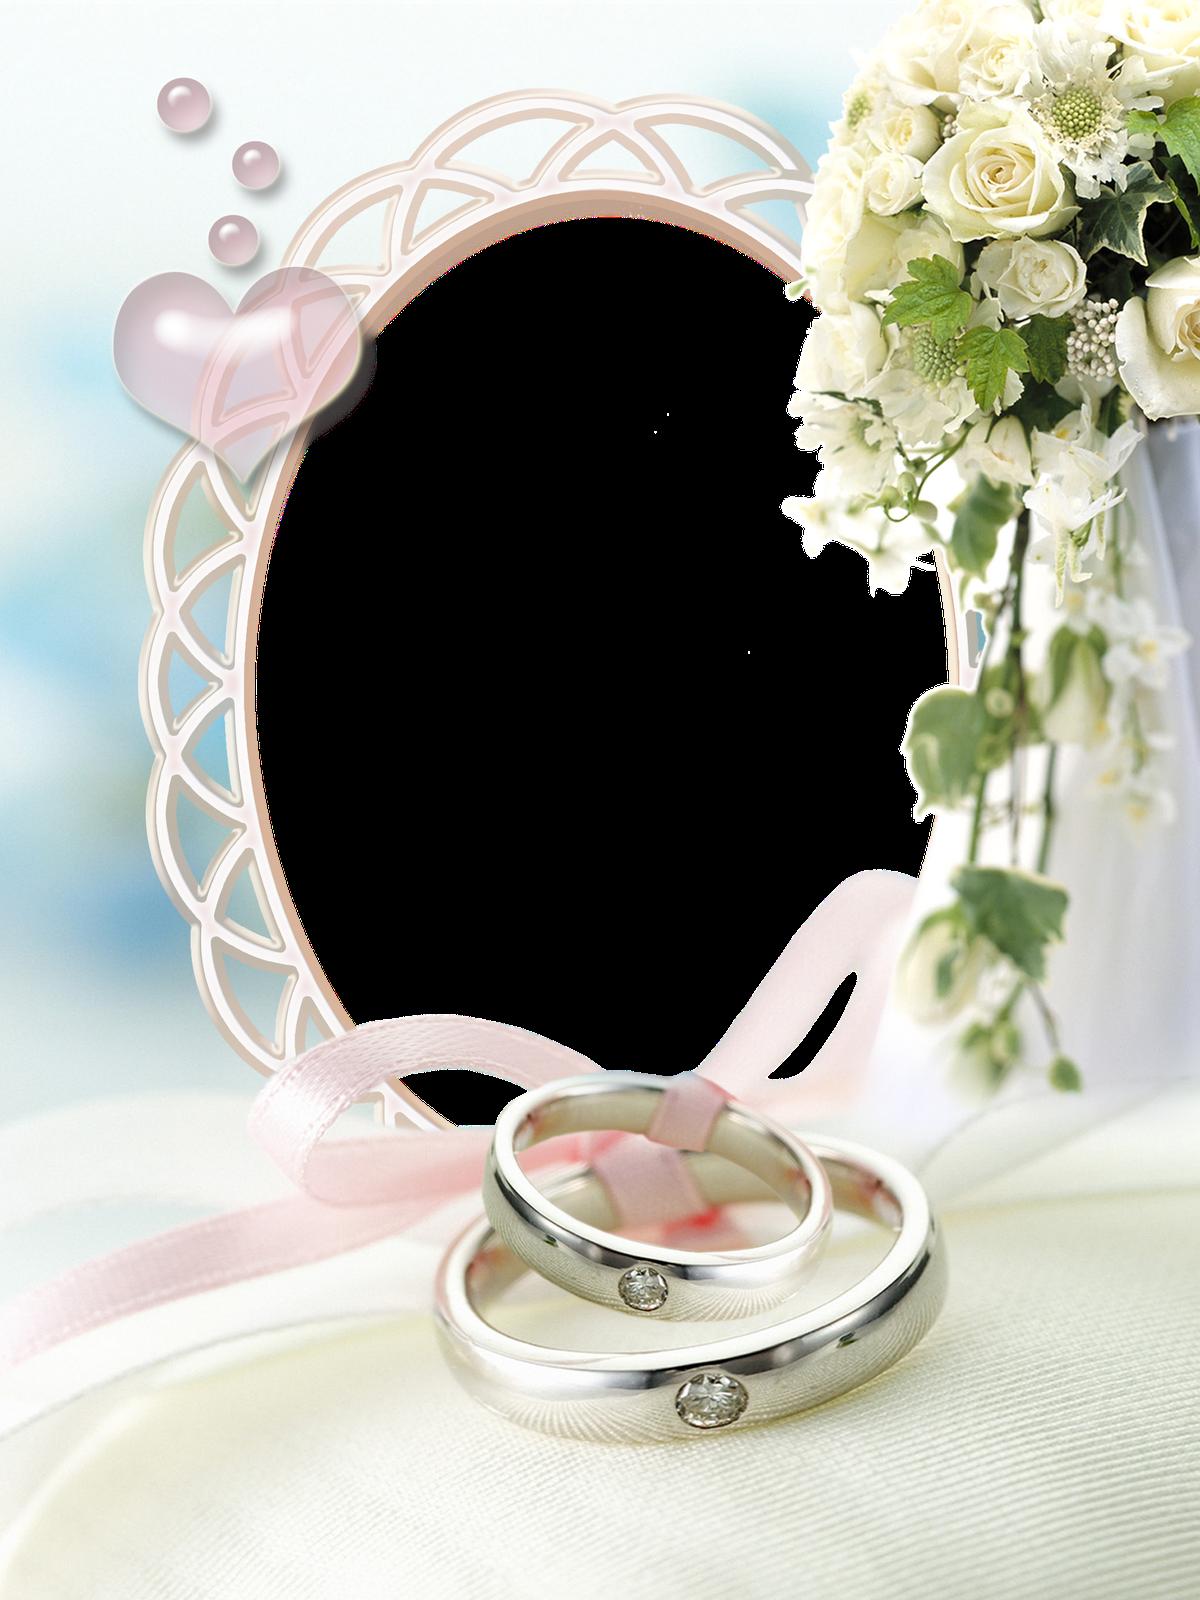 Wedding Transparent Photo Frame   Weddings   Pinterest   Wedding ...